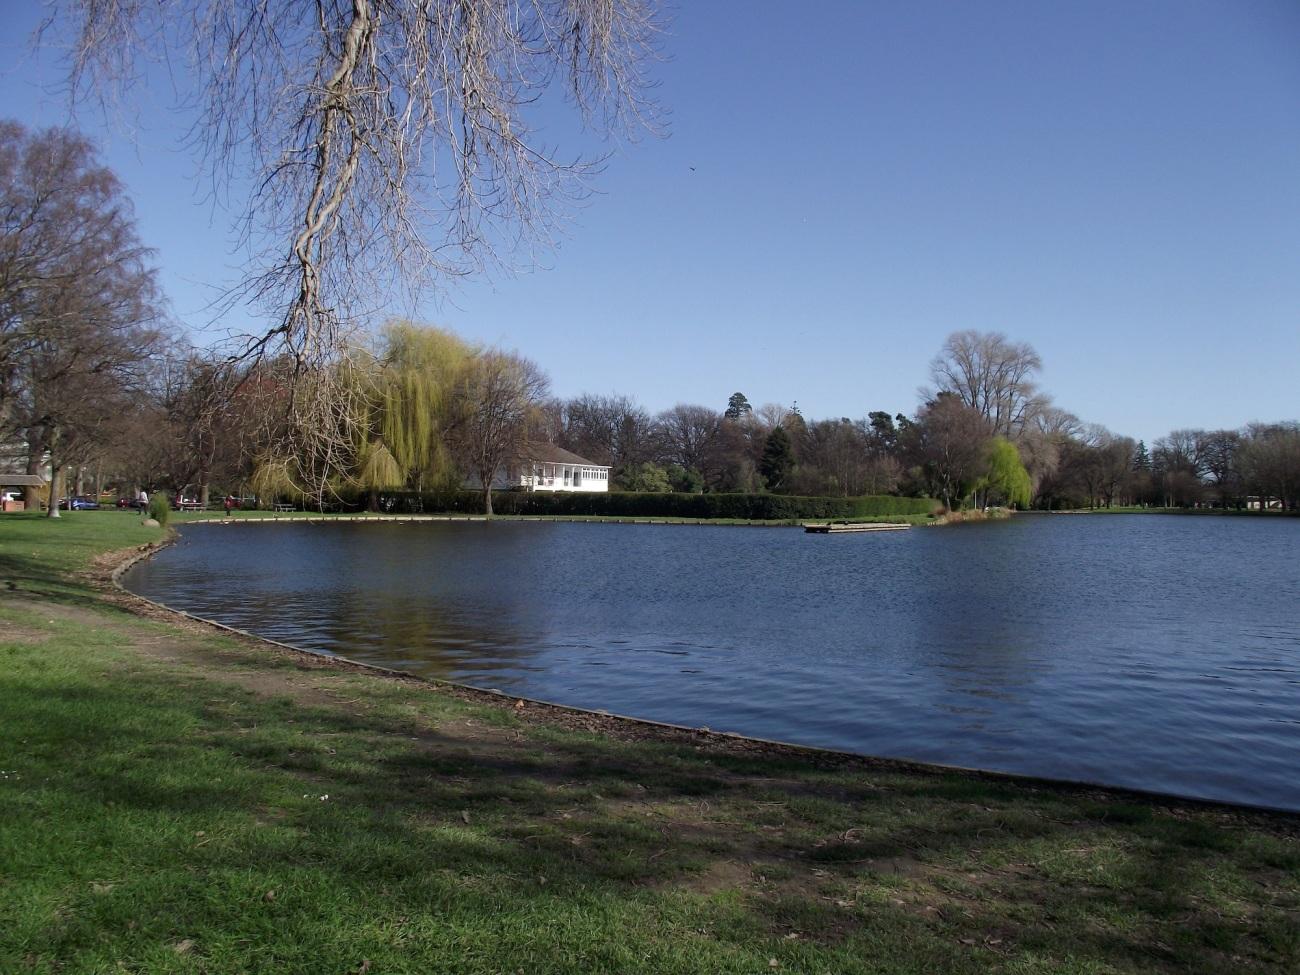 Victoria Lake, Hagley Park in August 2013 © Lemuel Lyes